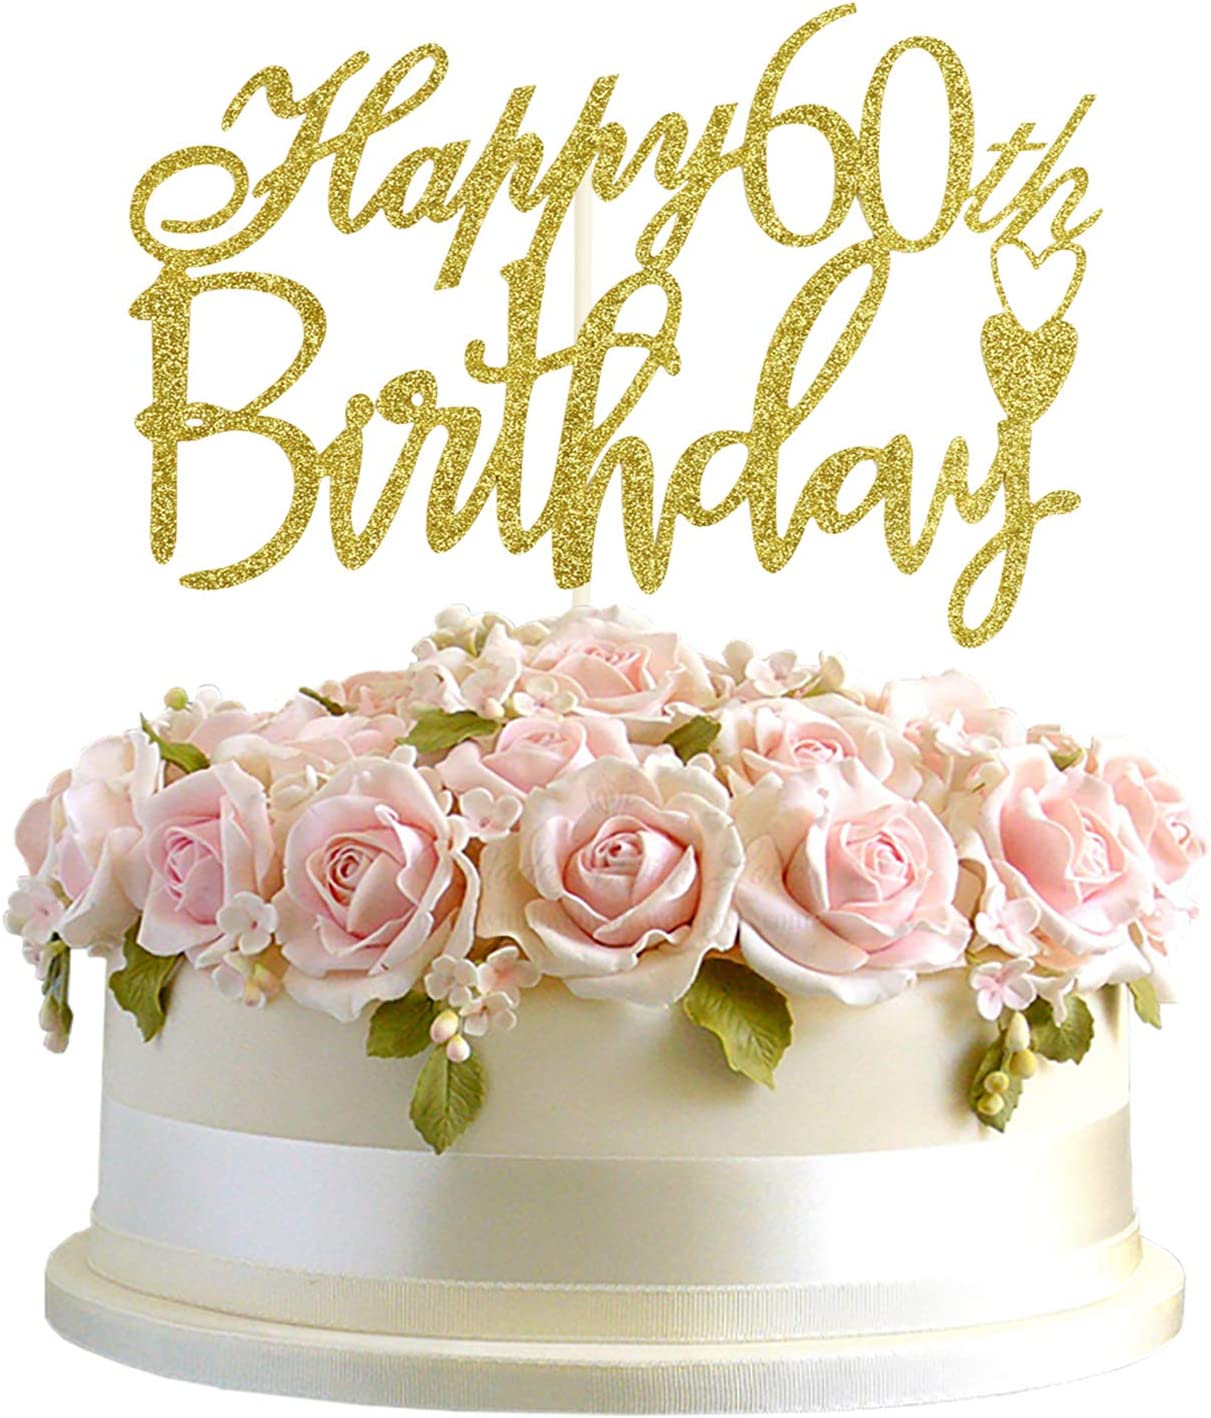 Home Cake 10-60th Happy Birthday Cake Topper Card Birthday Party Cake Diy Decor